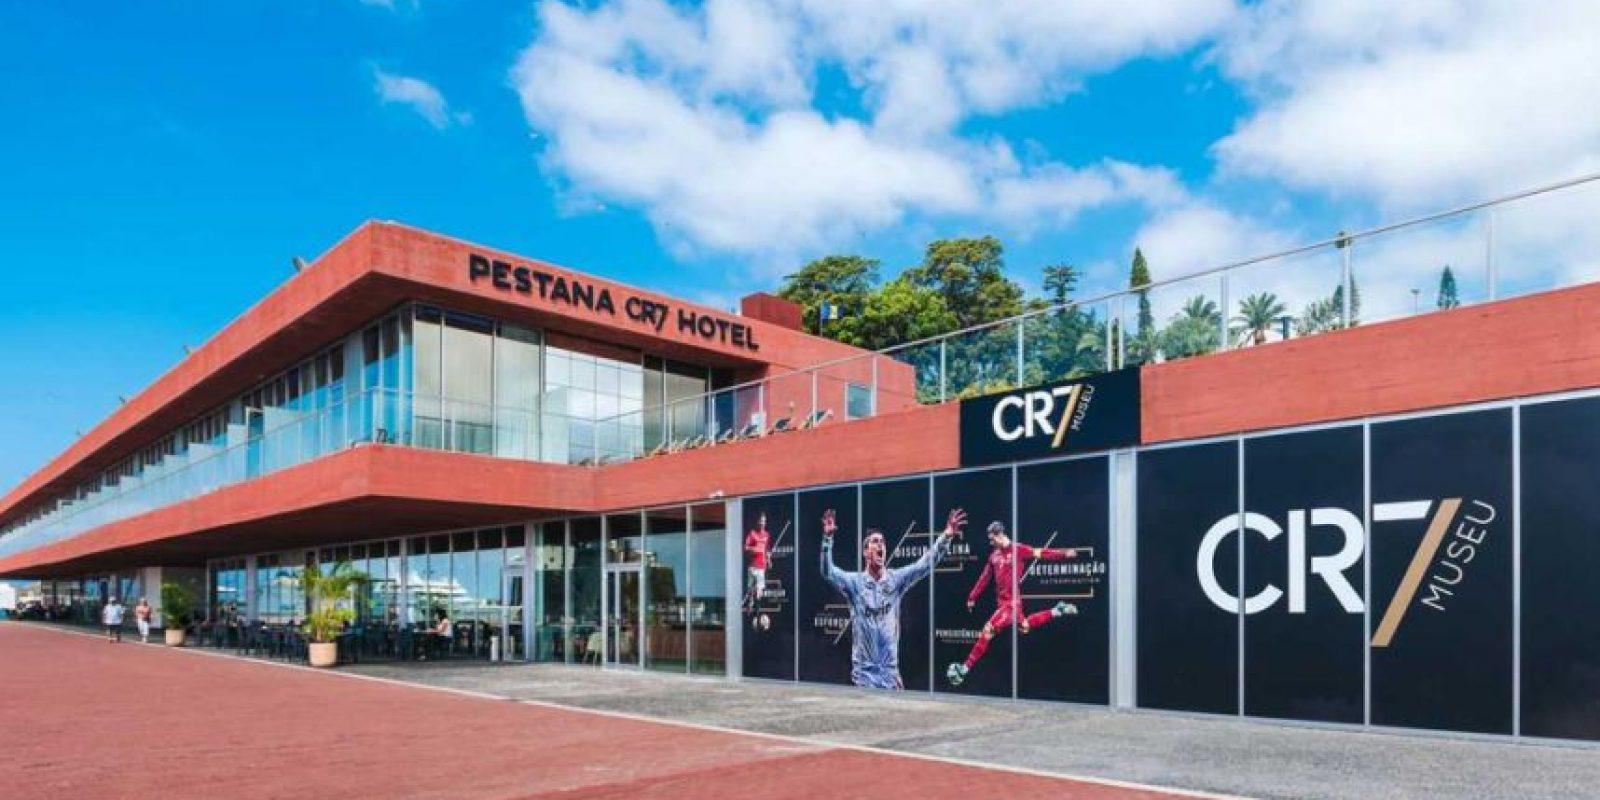 El Pestana CR7 Hotel está a un costado del museo Cristiano Ronaldo Foto:Sitio web Pestana CR7